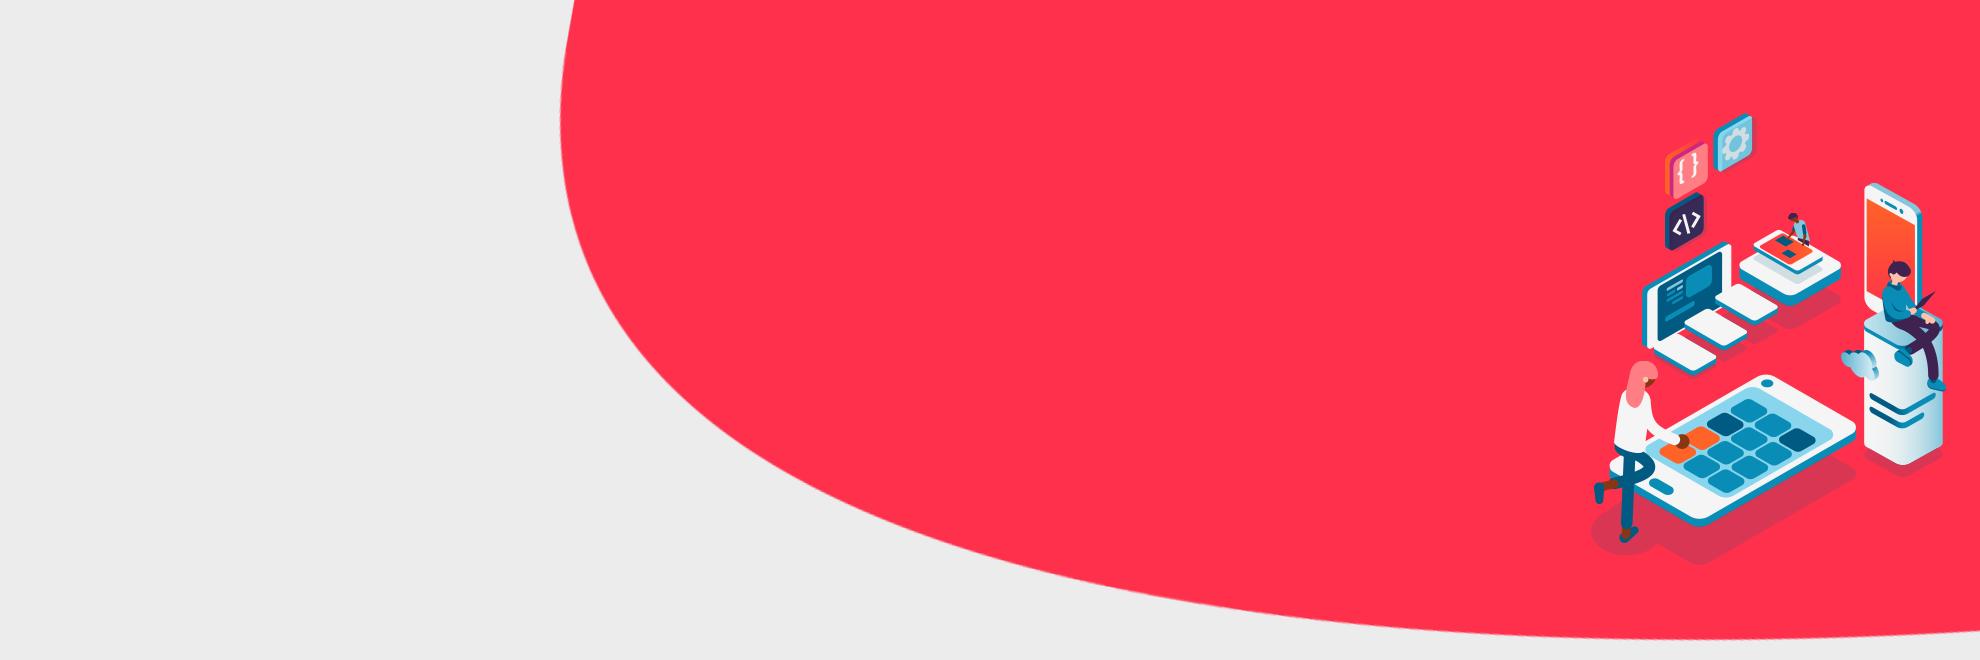 29.9.2021: Sogeti sponsert die ASQF Quality Night München